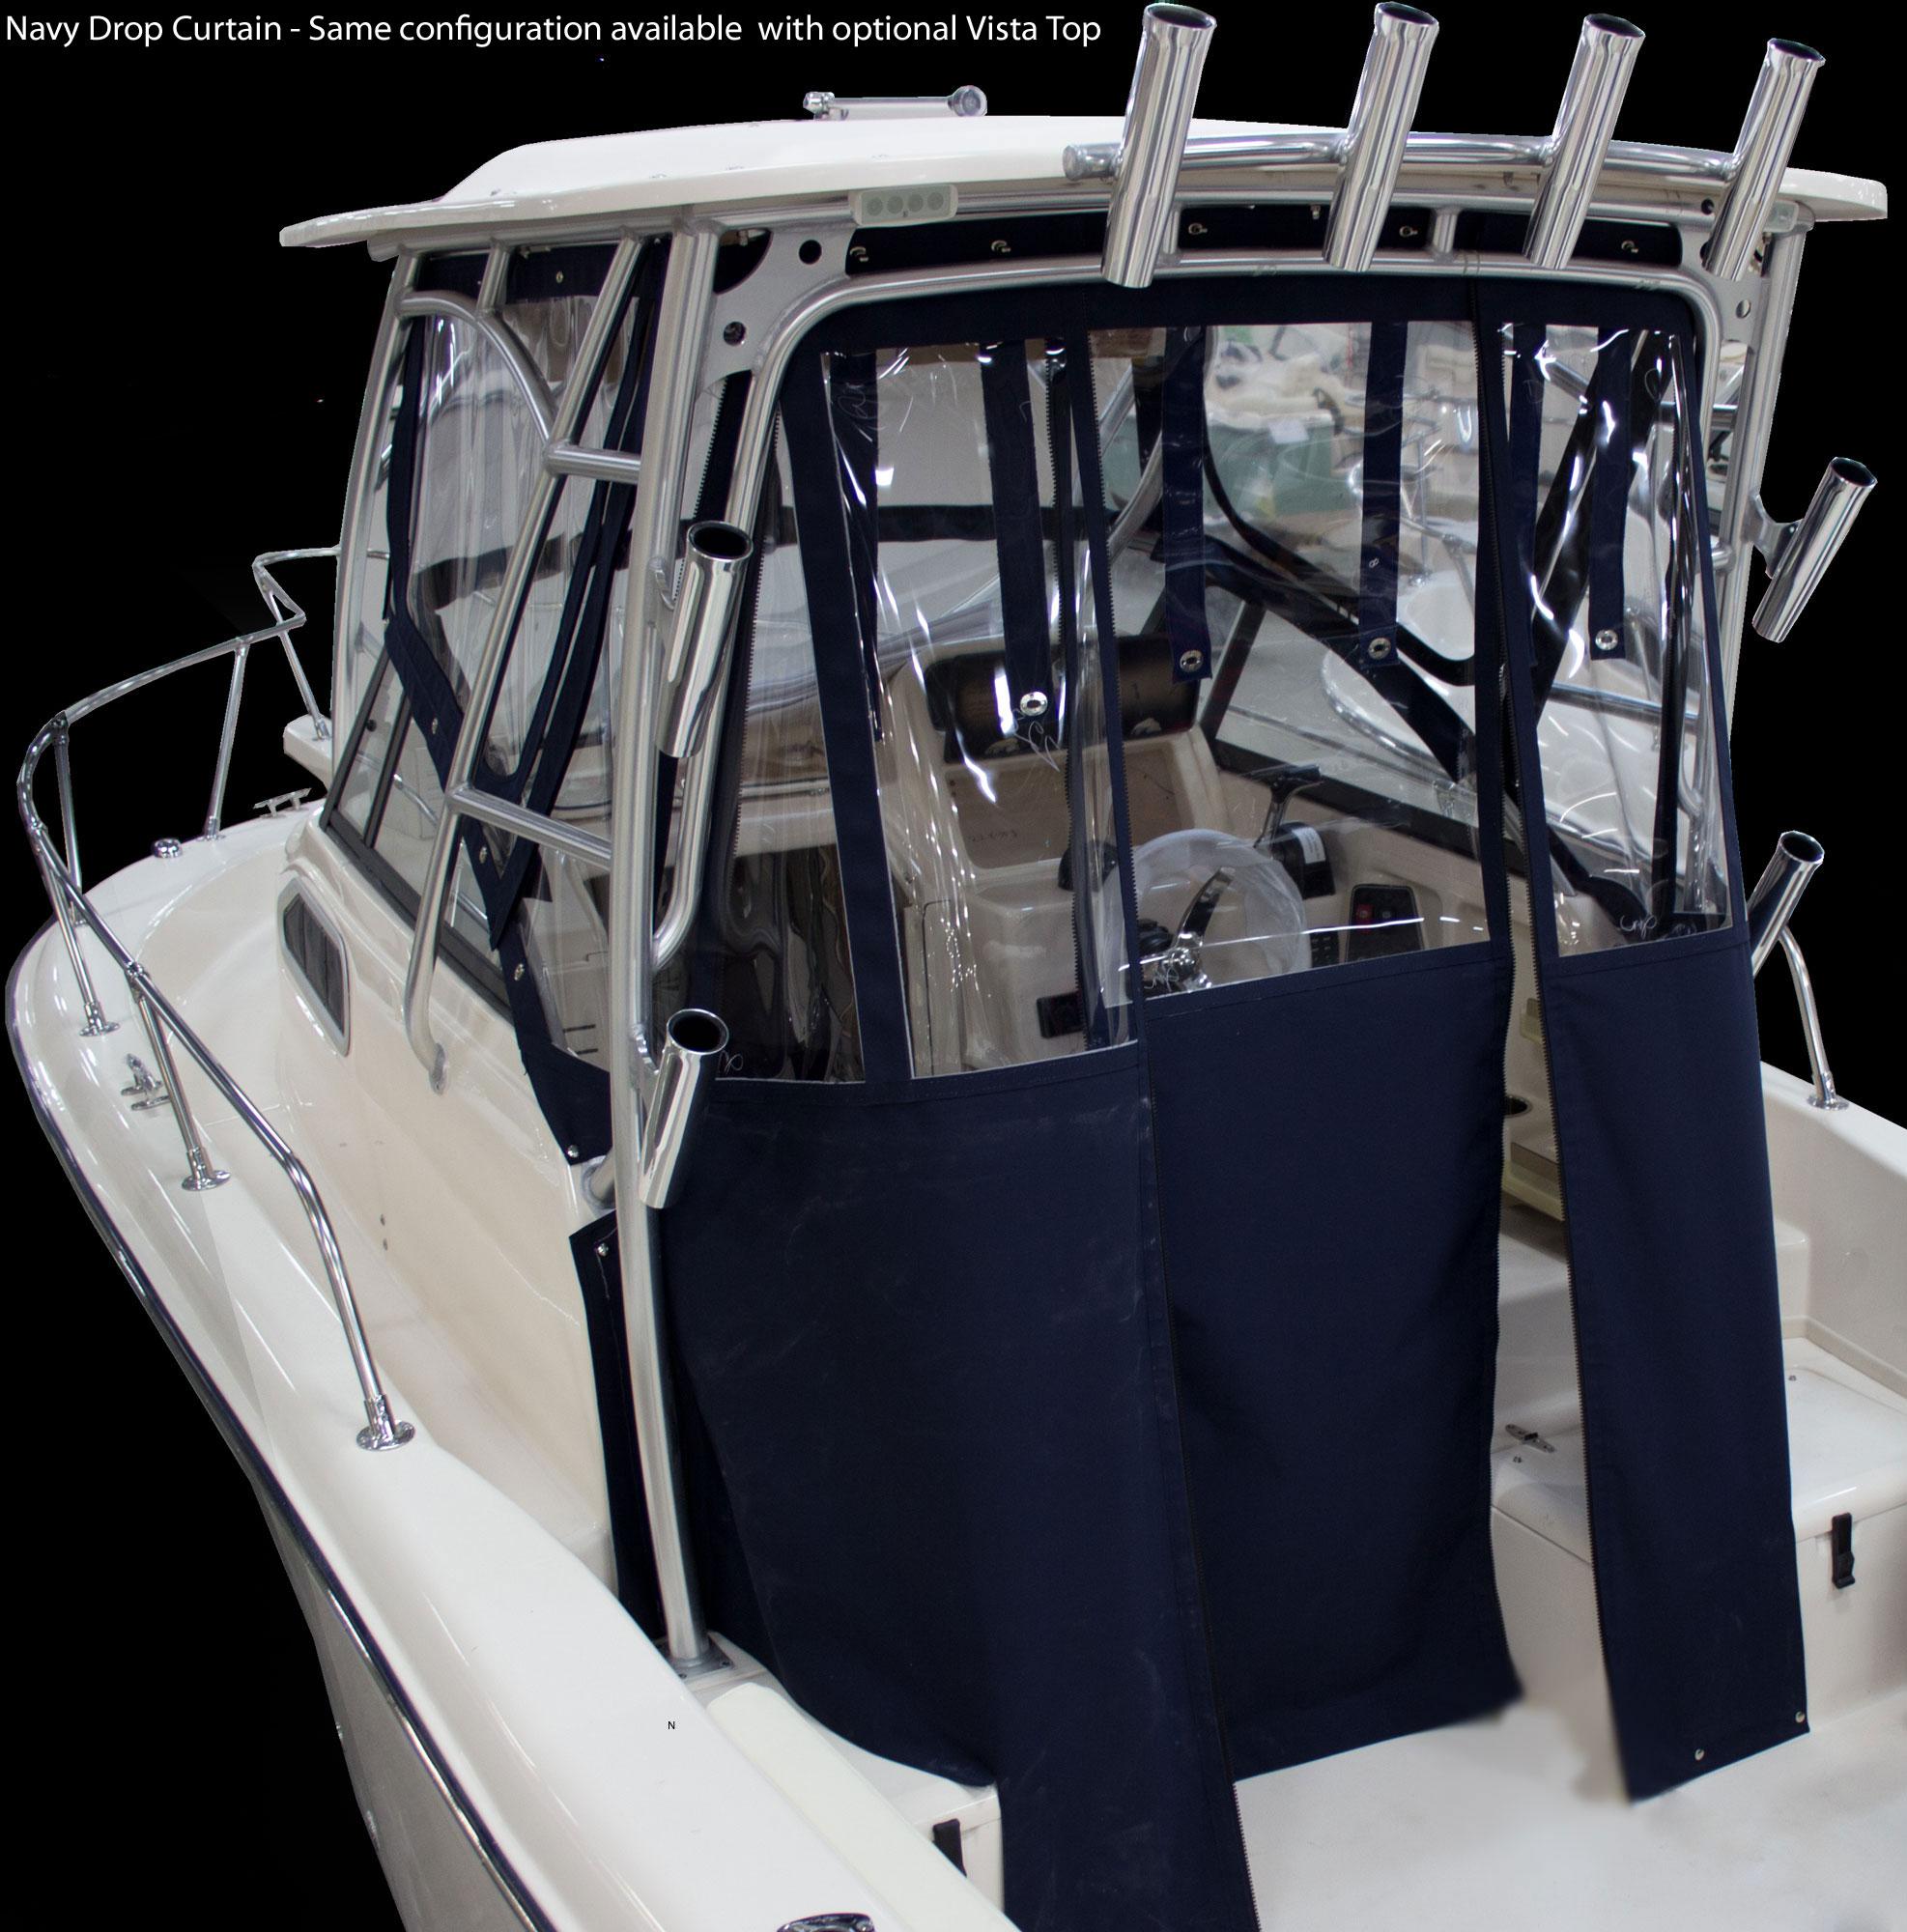 Adventure 208 Grady White 20 Walkaround Cabin Boat Drop Curtain